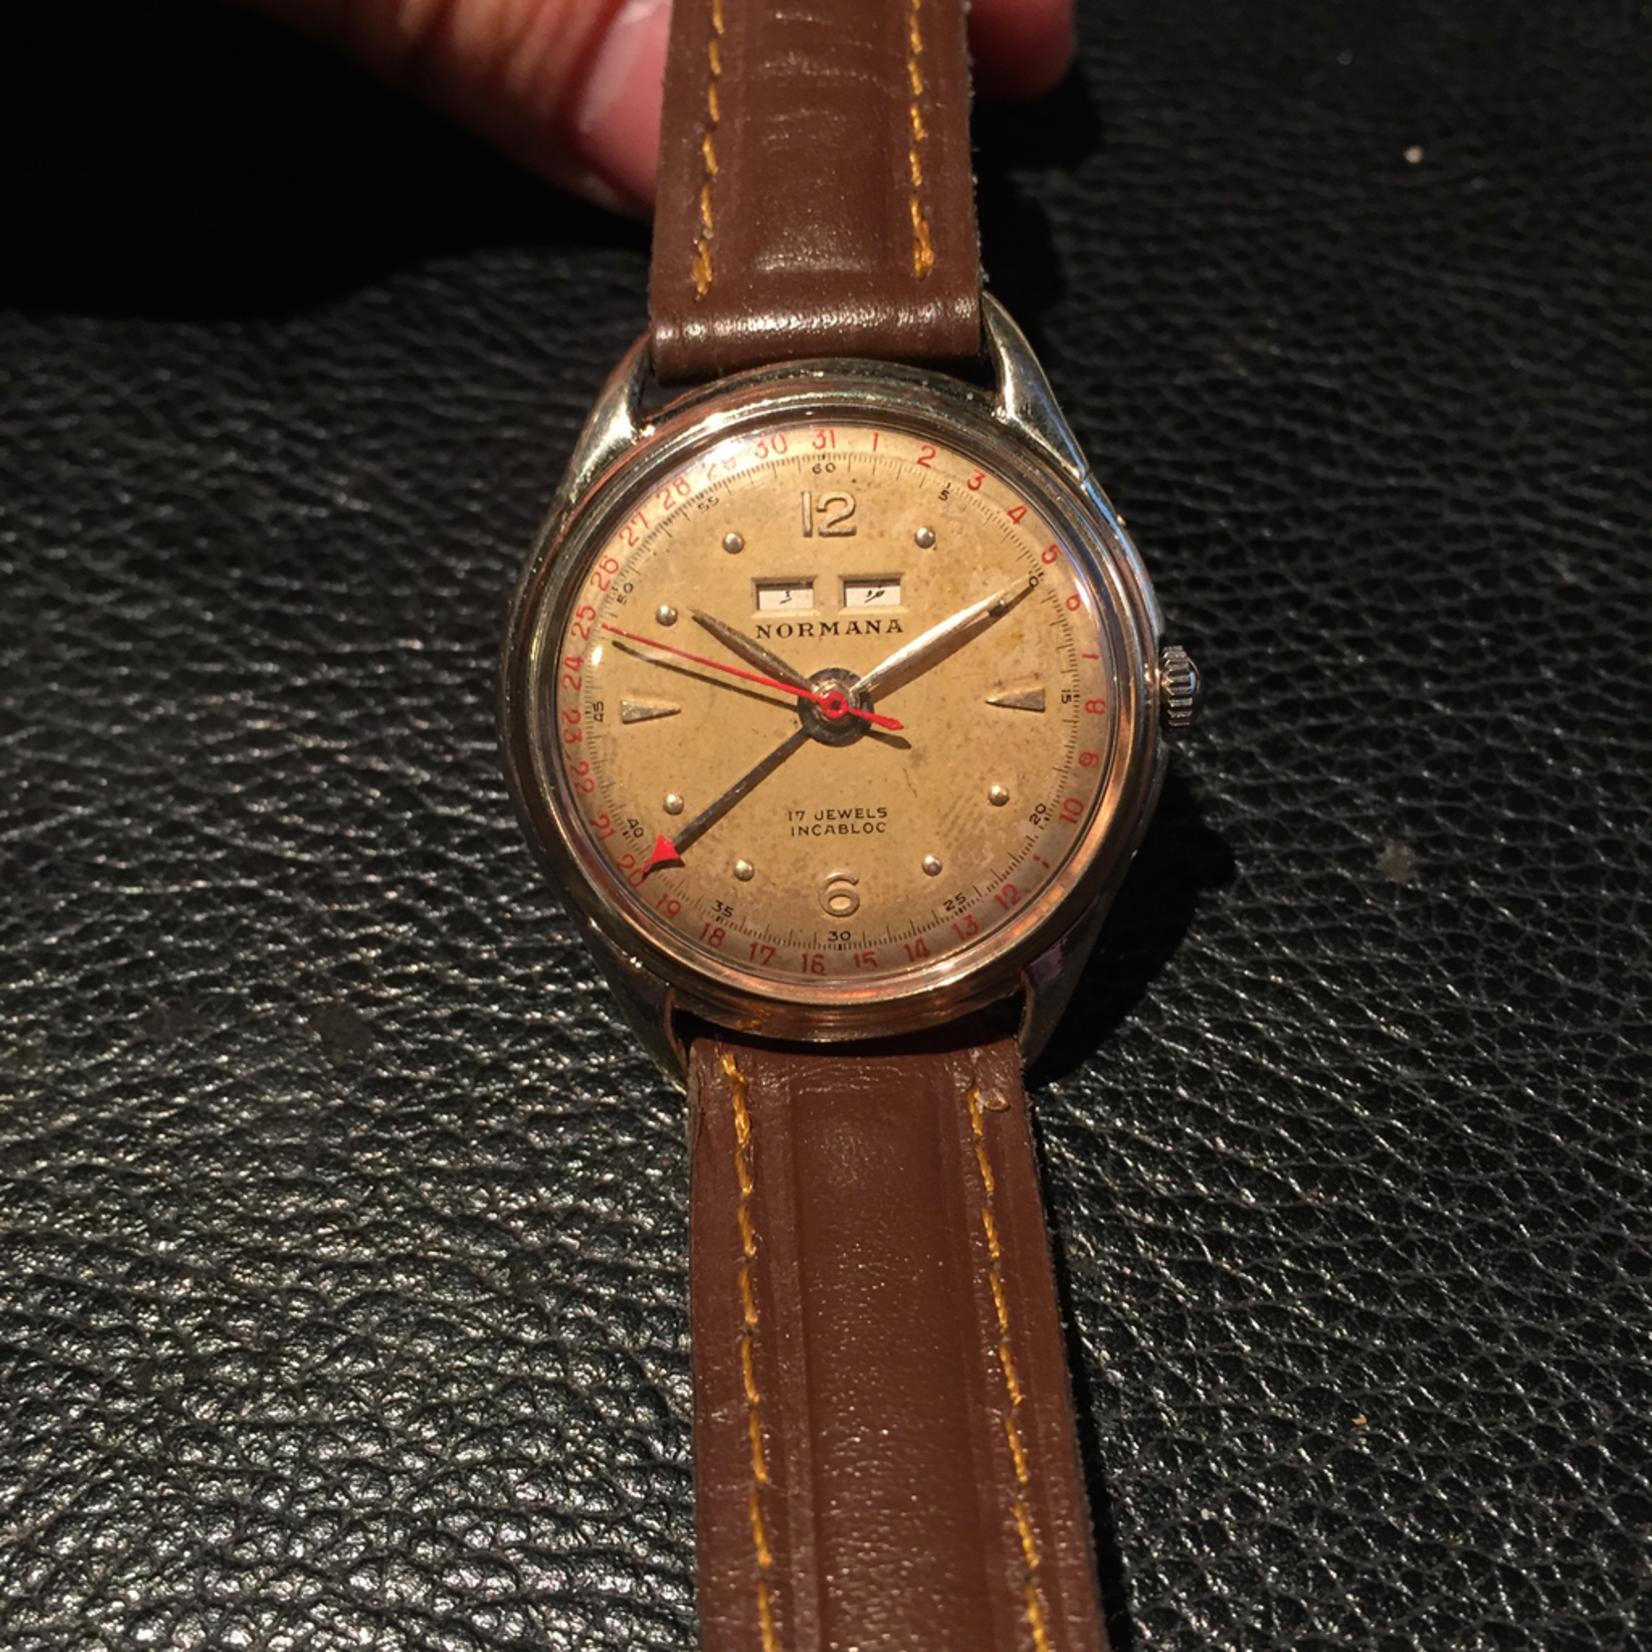 TAJHOME Vintage Watch  NORMANA